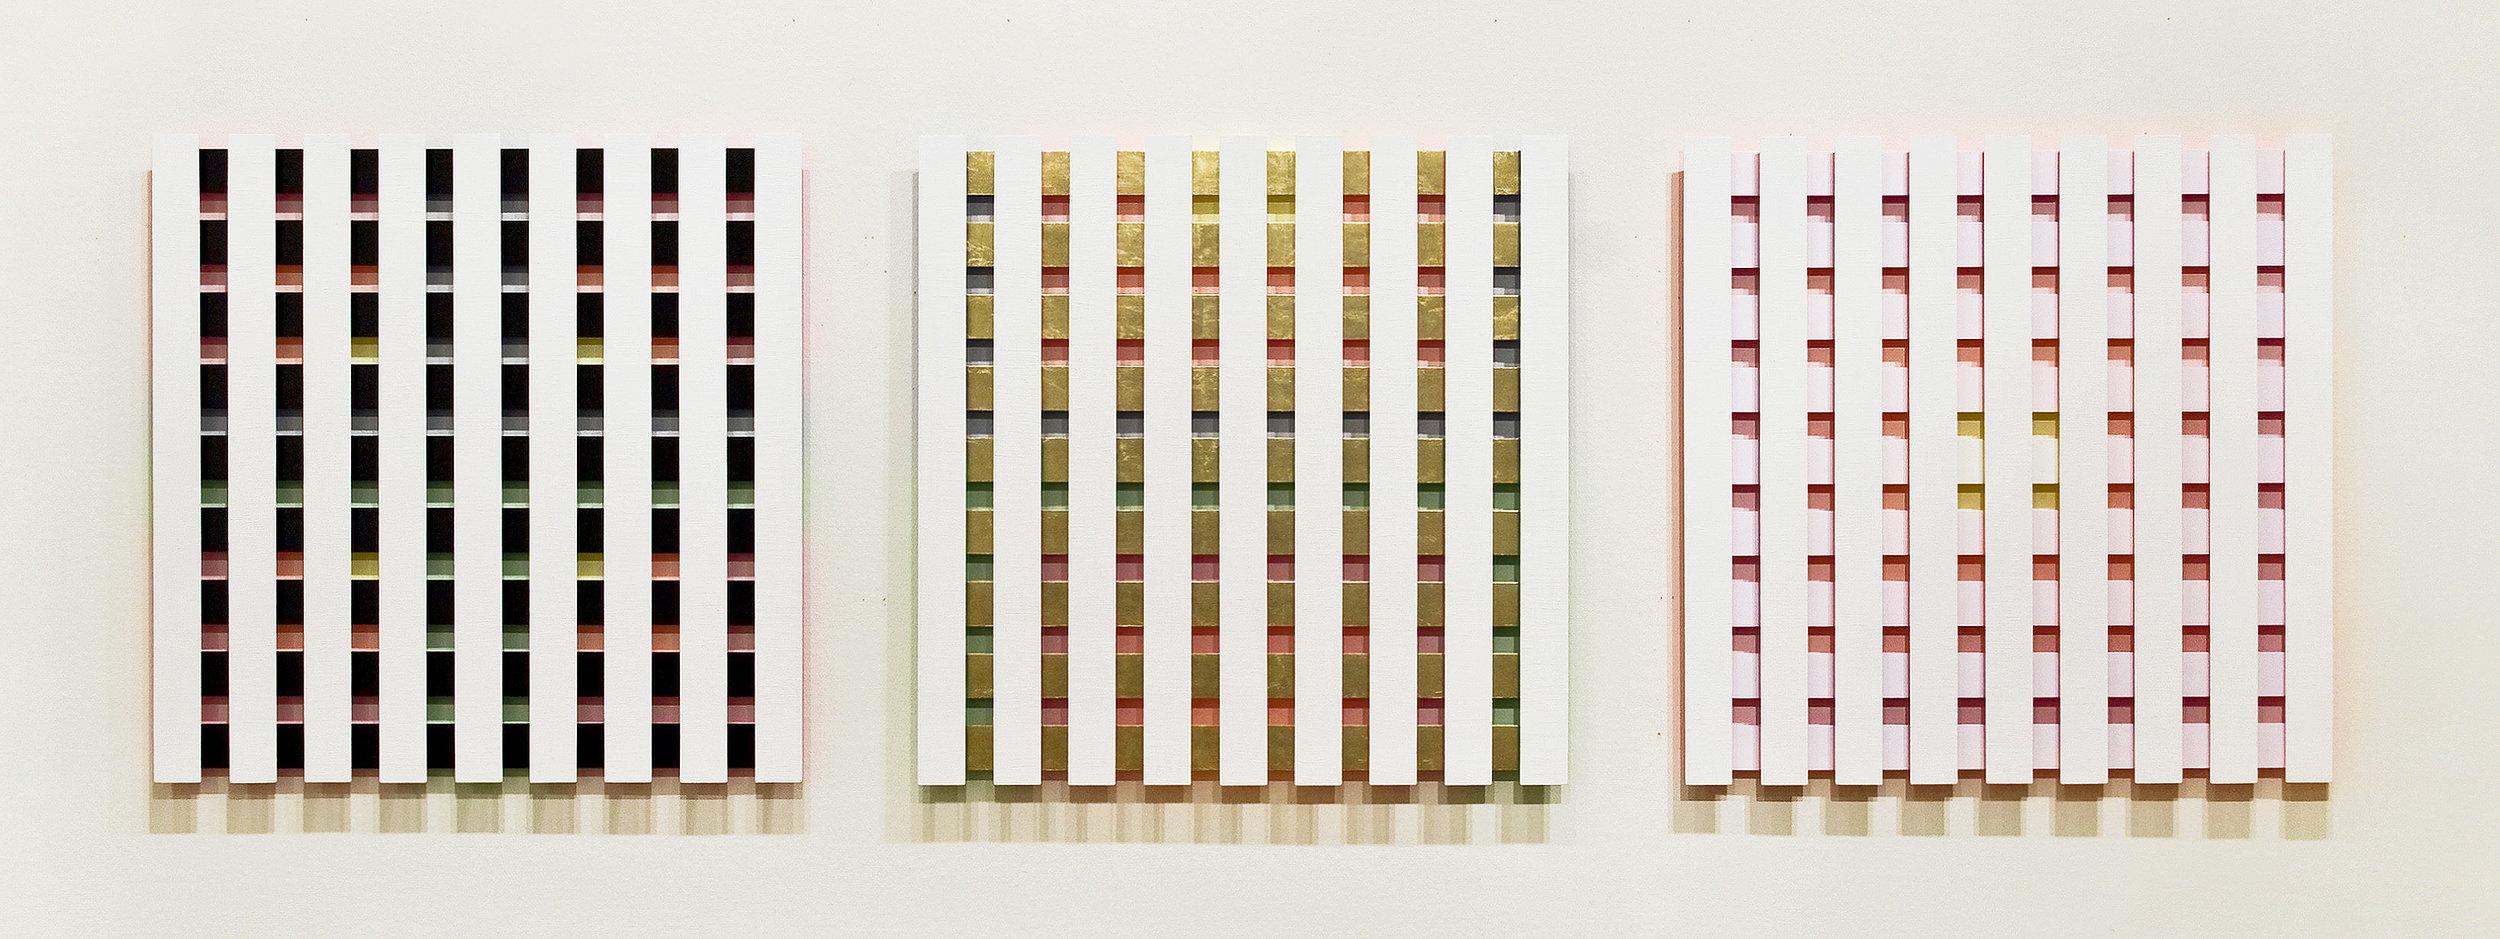 1m akril, les, trikrat 121 x 121 cm, 2008.jpg